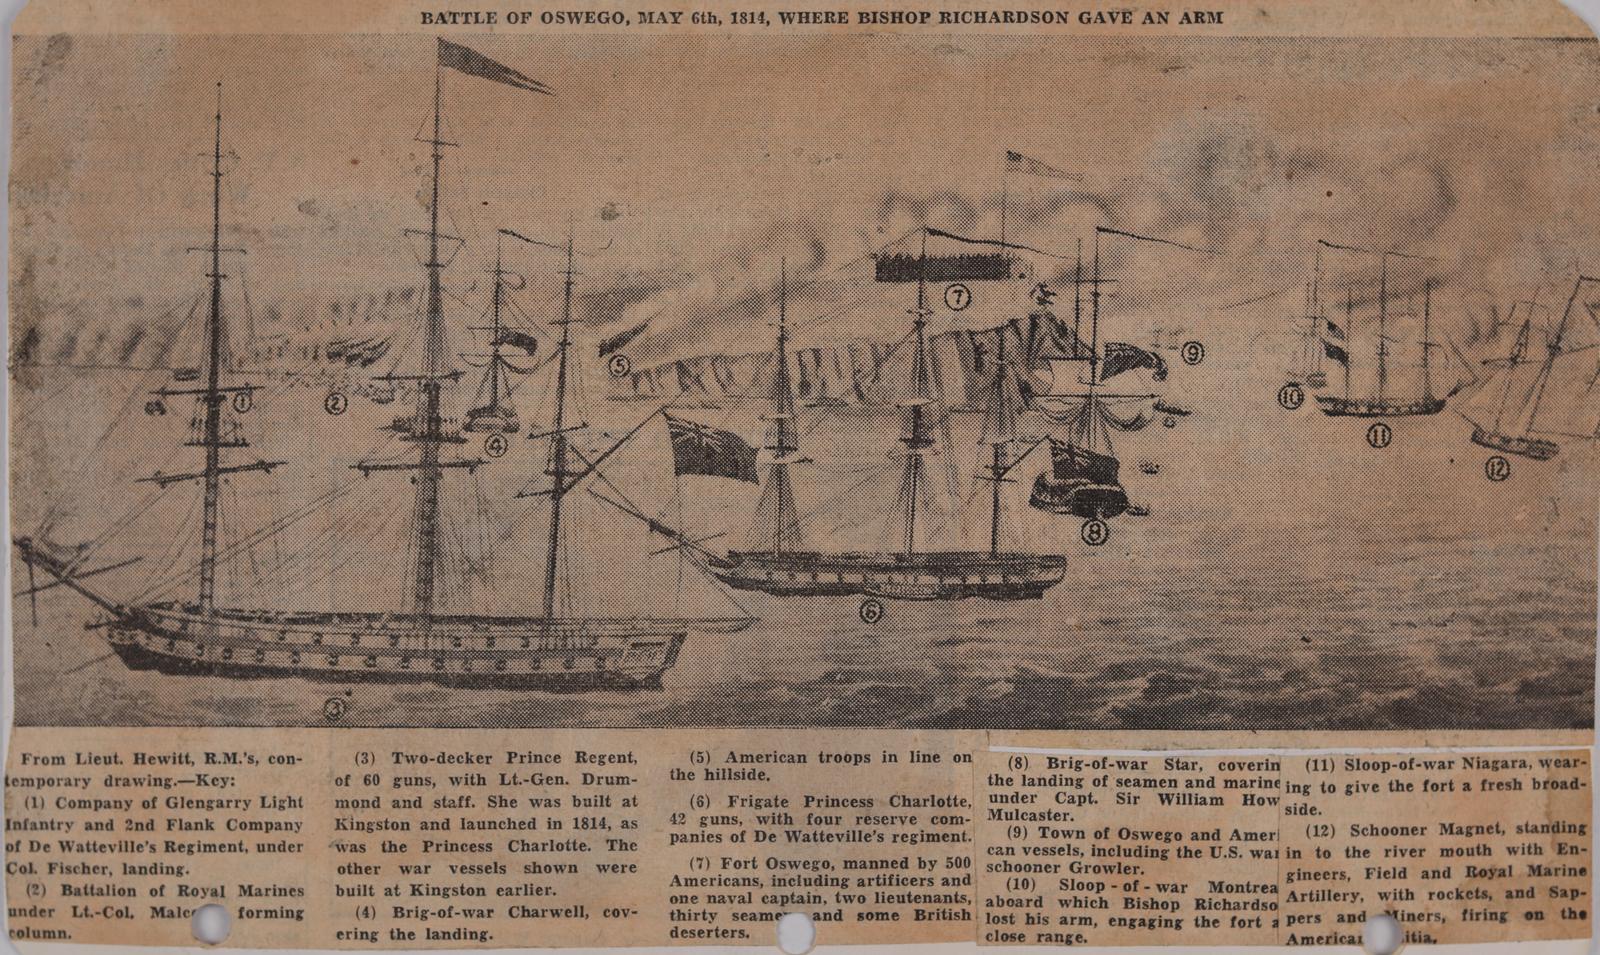 Seagoing Bishop Circuit Riding Pilot: Schooner Days DXCVII (597)